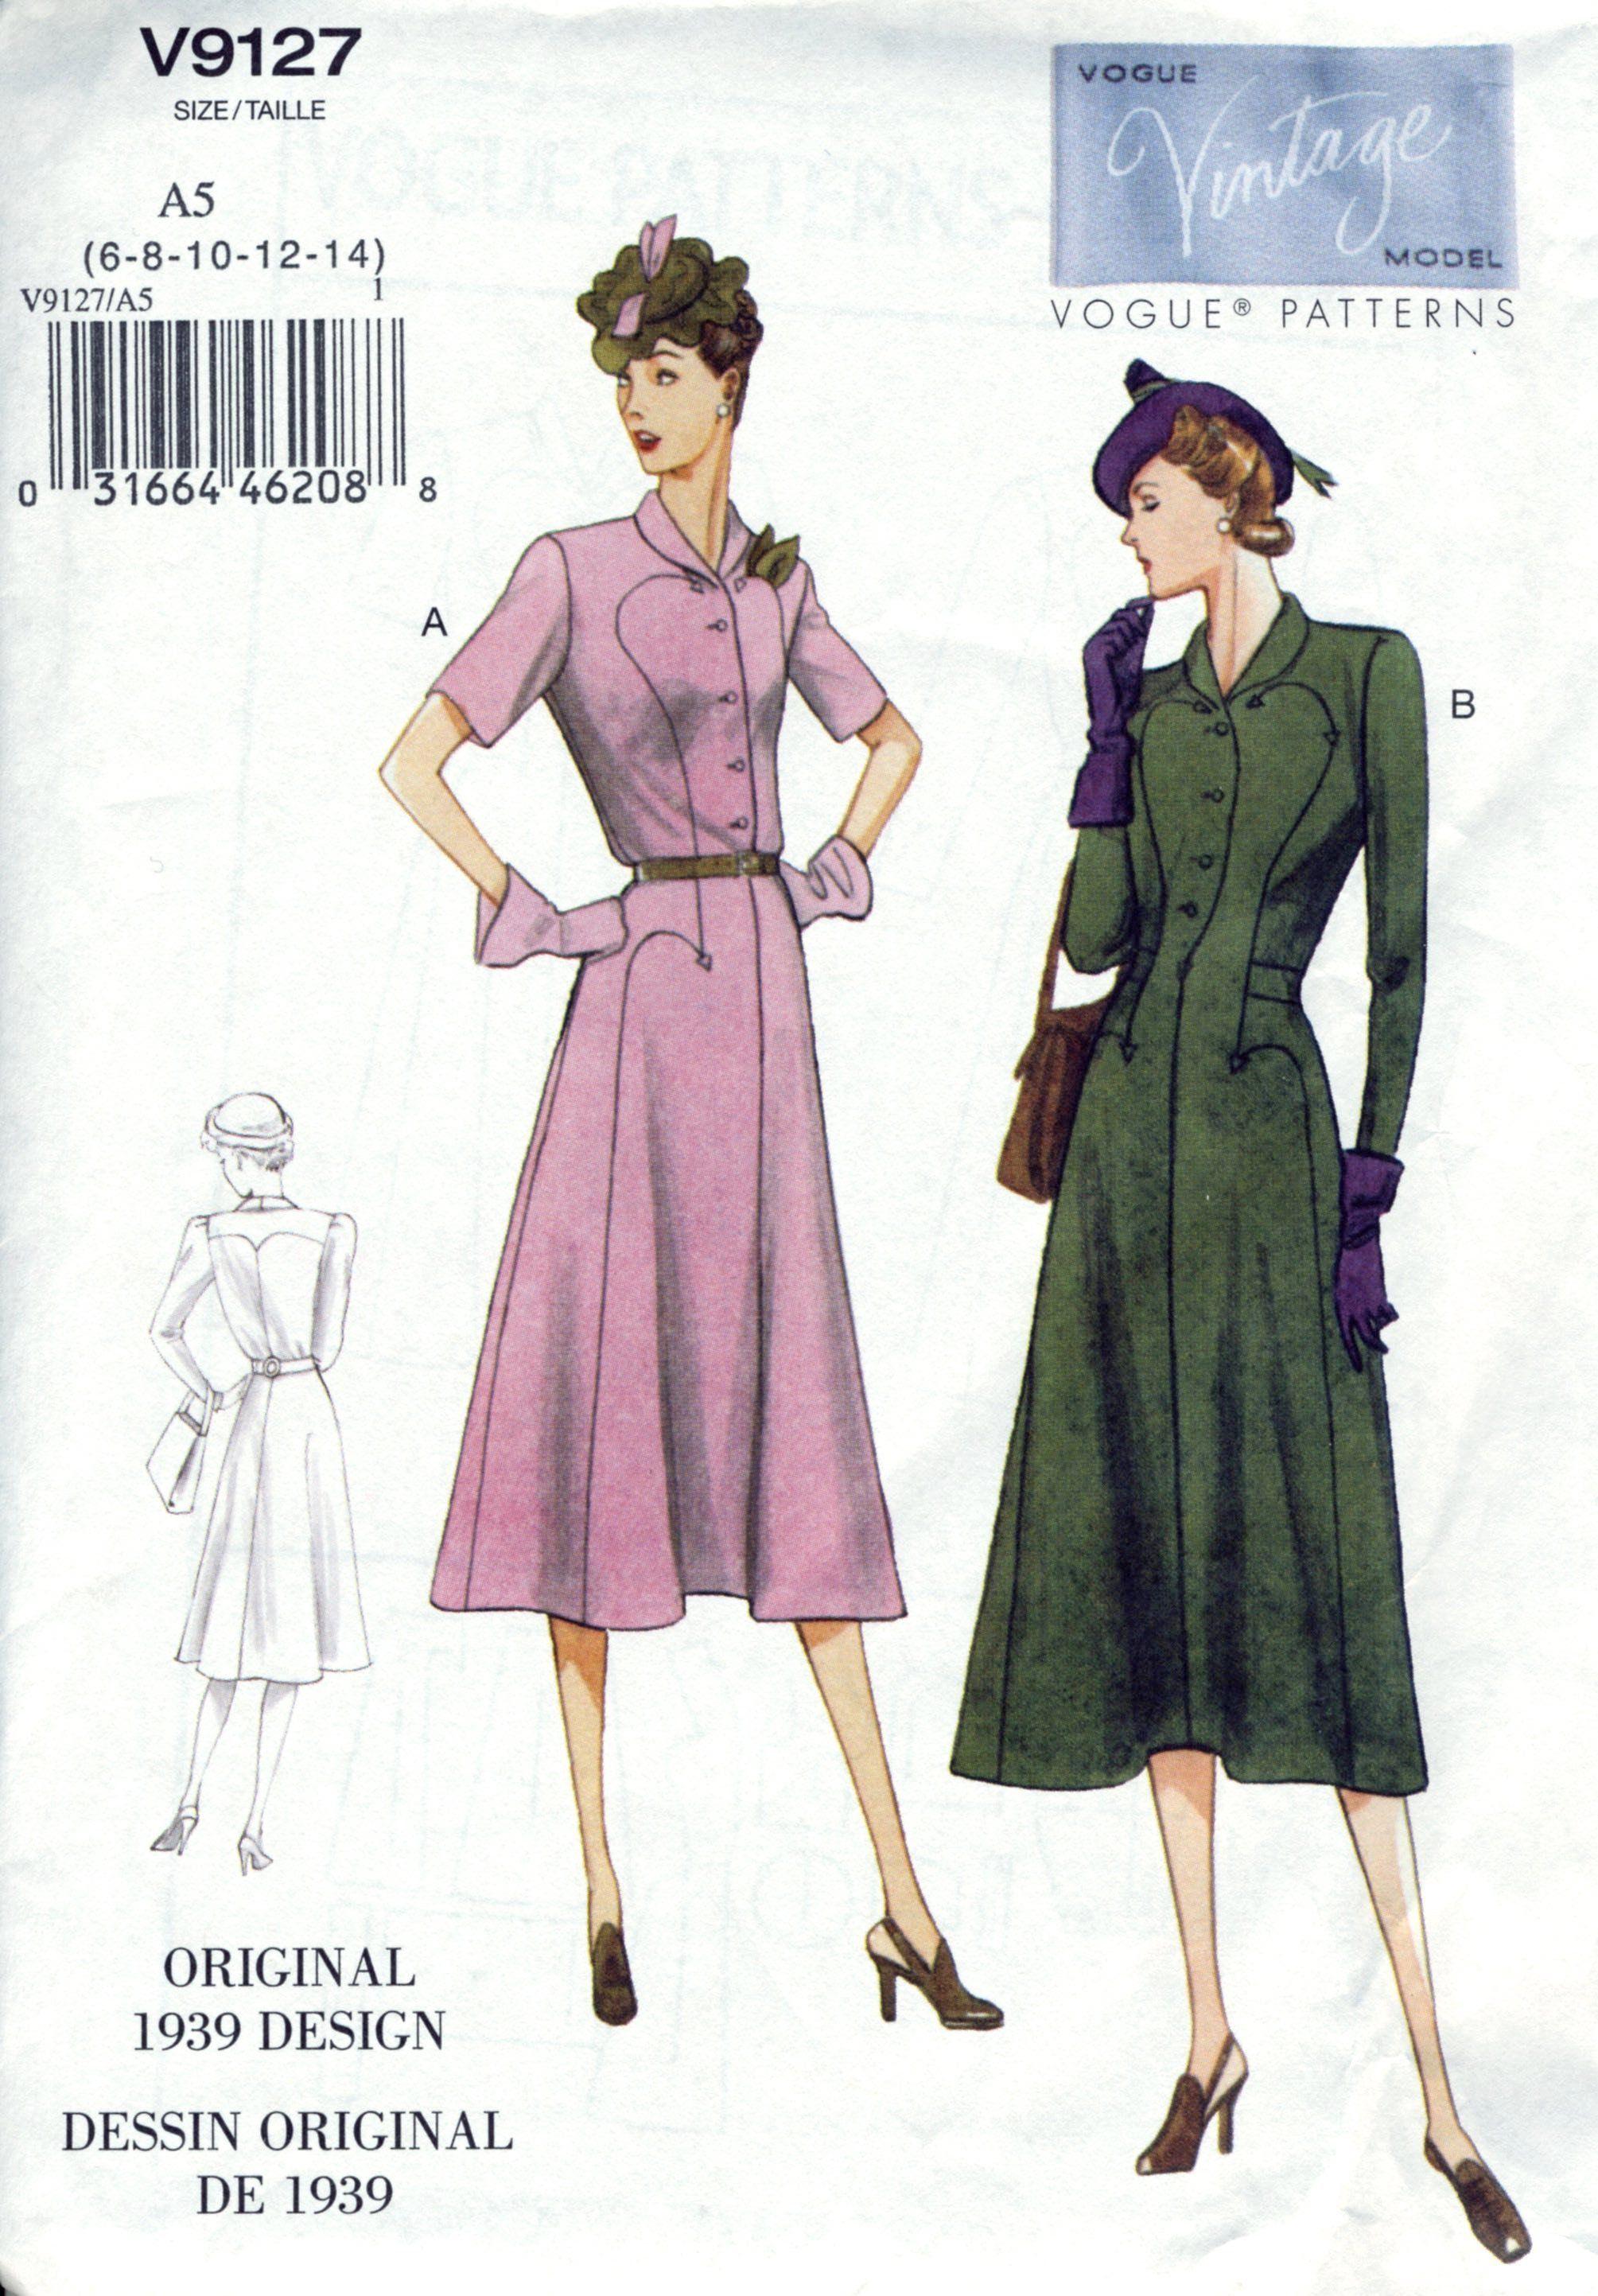 Vogue V9127 Repro 1930 S Dress Pattern Reissue Vogue Vogue Patterns Vintage Vogue Sewing Patterns Pattern Fashion